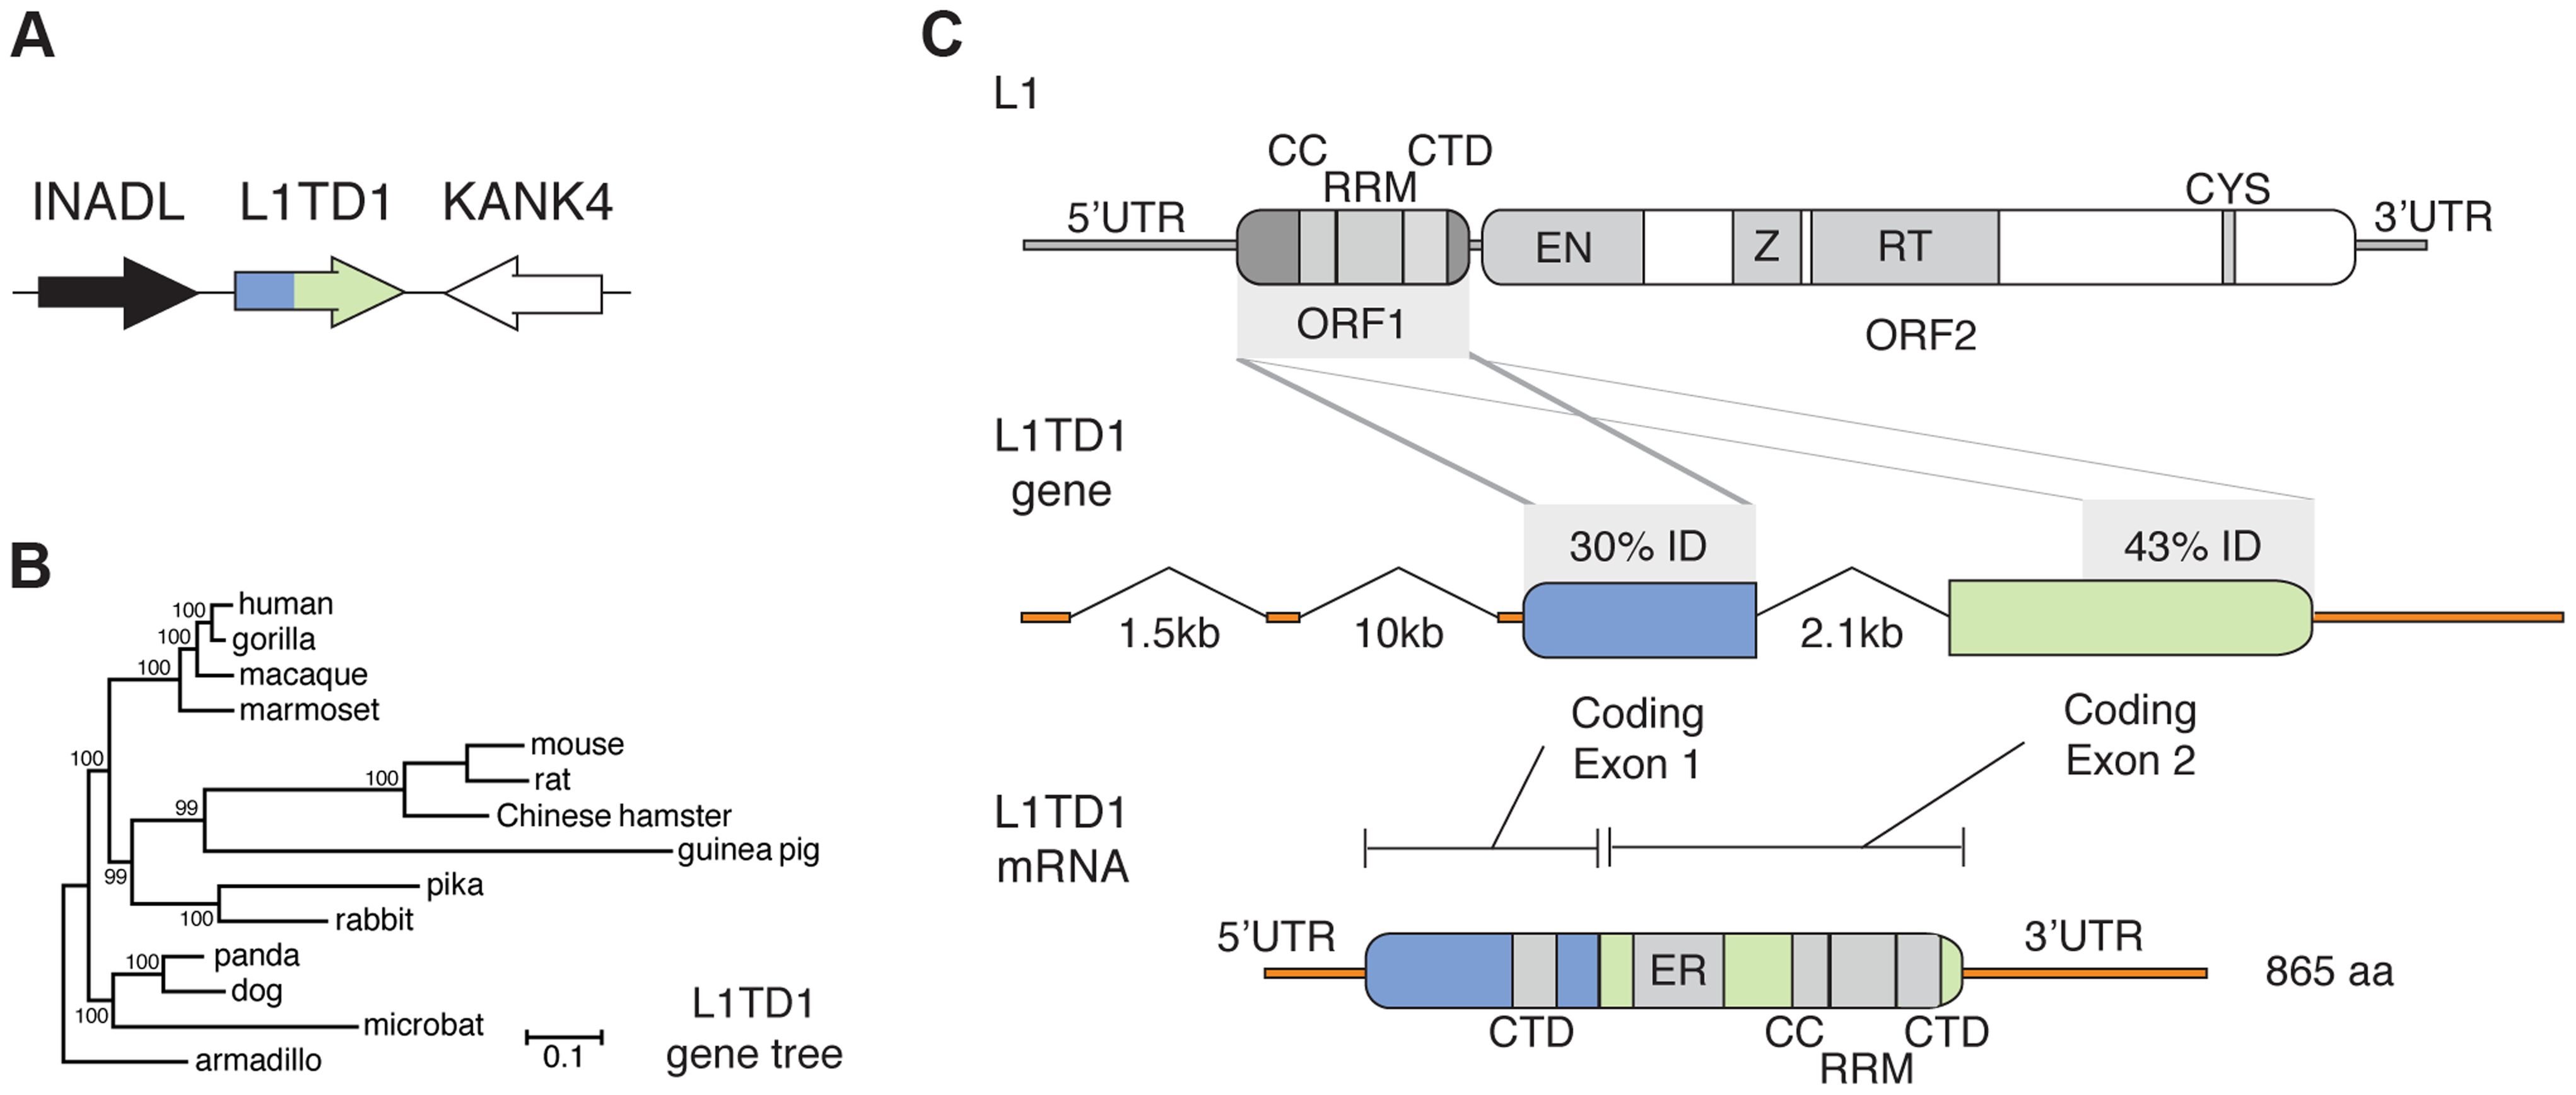 The mammalian <i>L1TD1</i> gene was born from a tandem insertion of L1 ORF1.